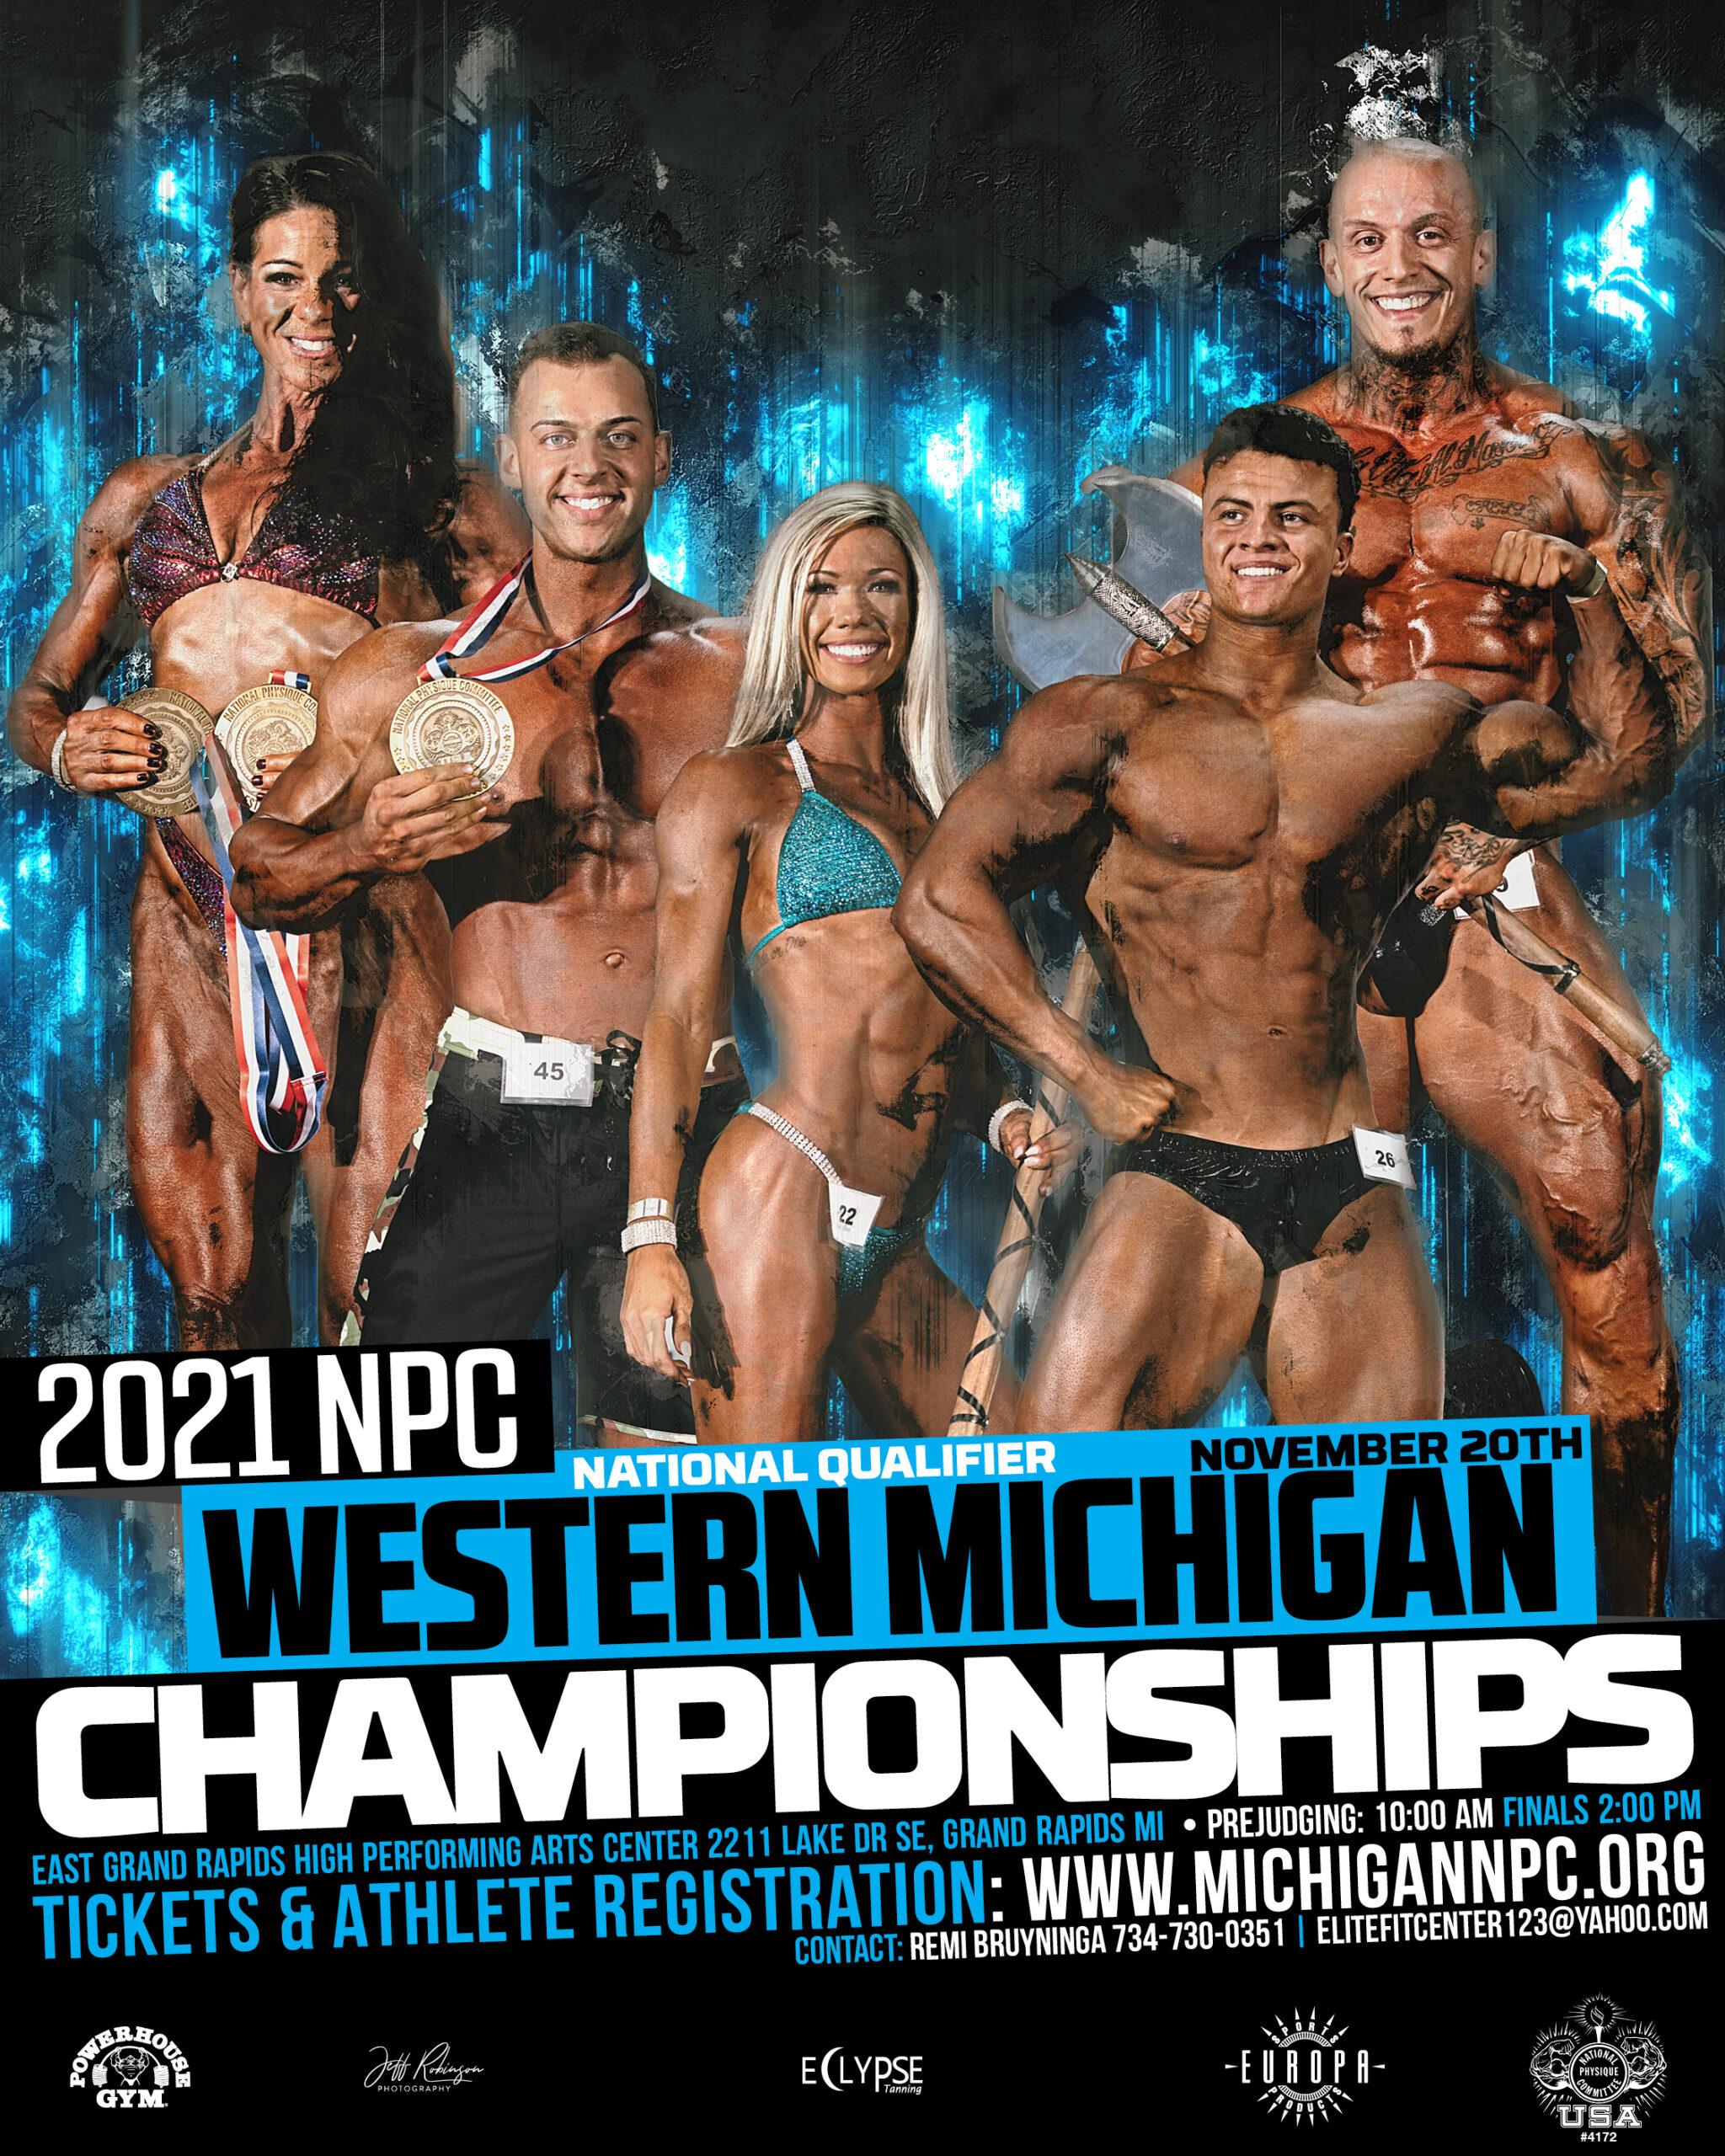 2021 NPC Western Michigan Bodybuilding Championships Poster